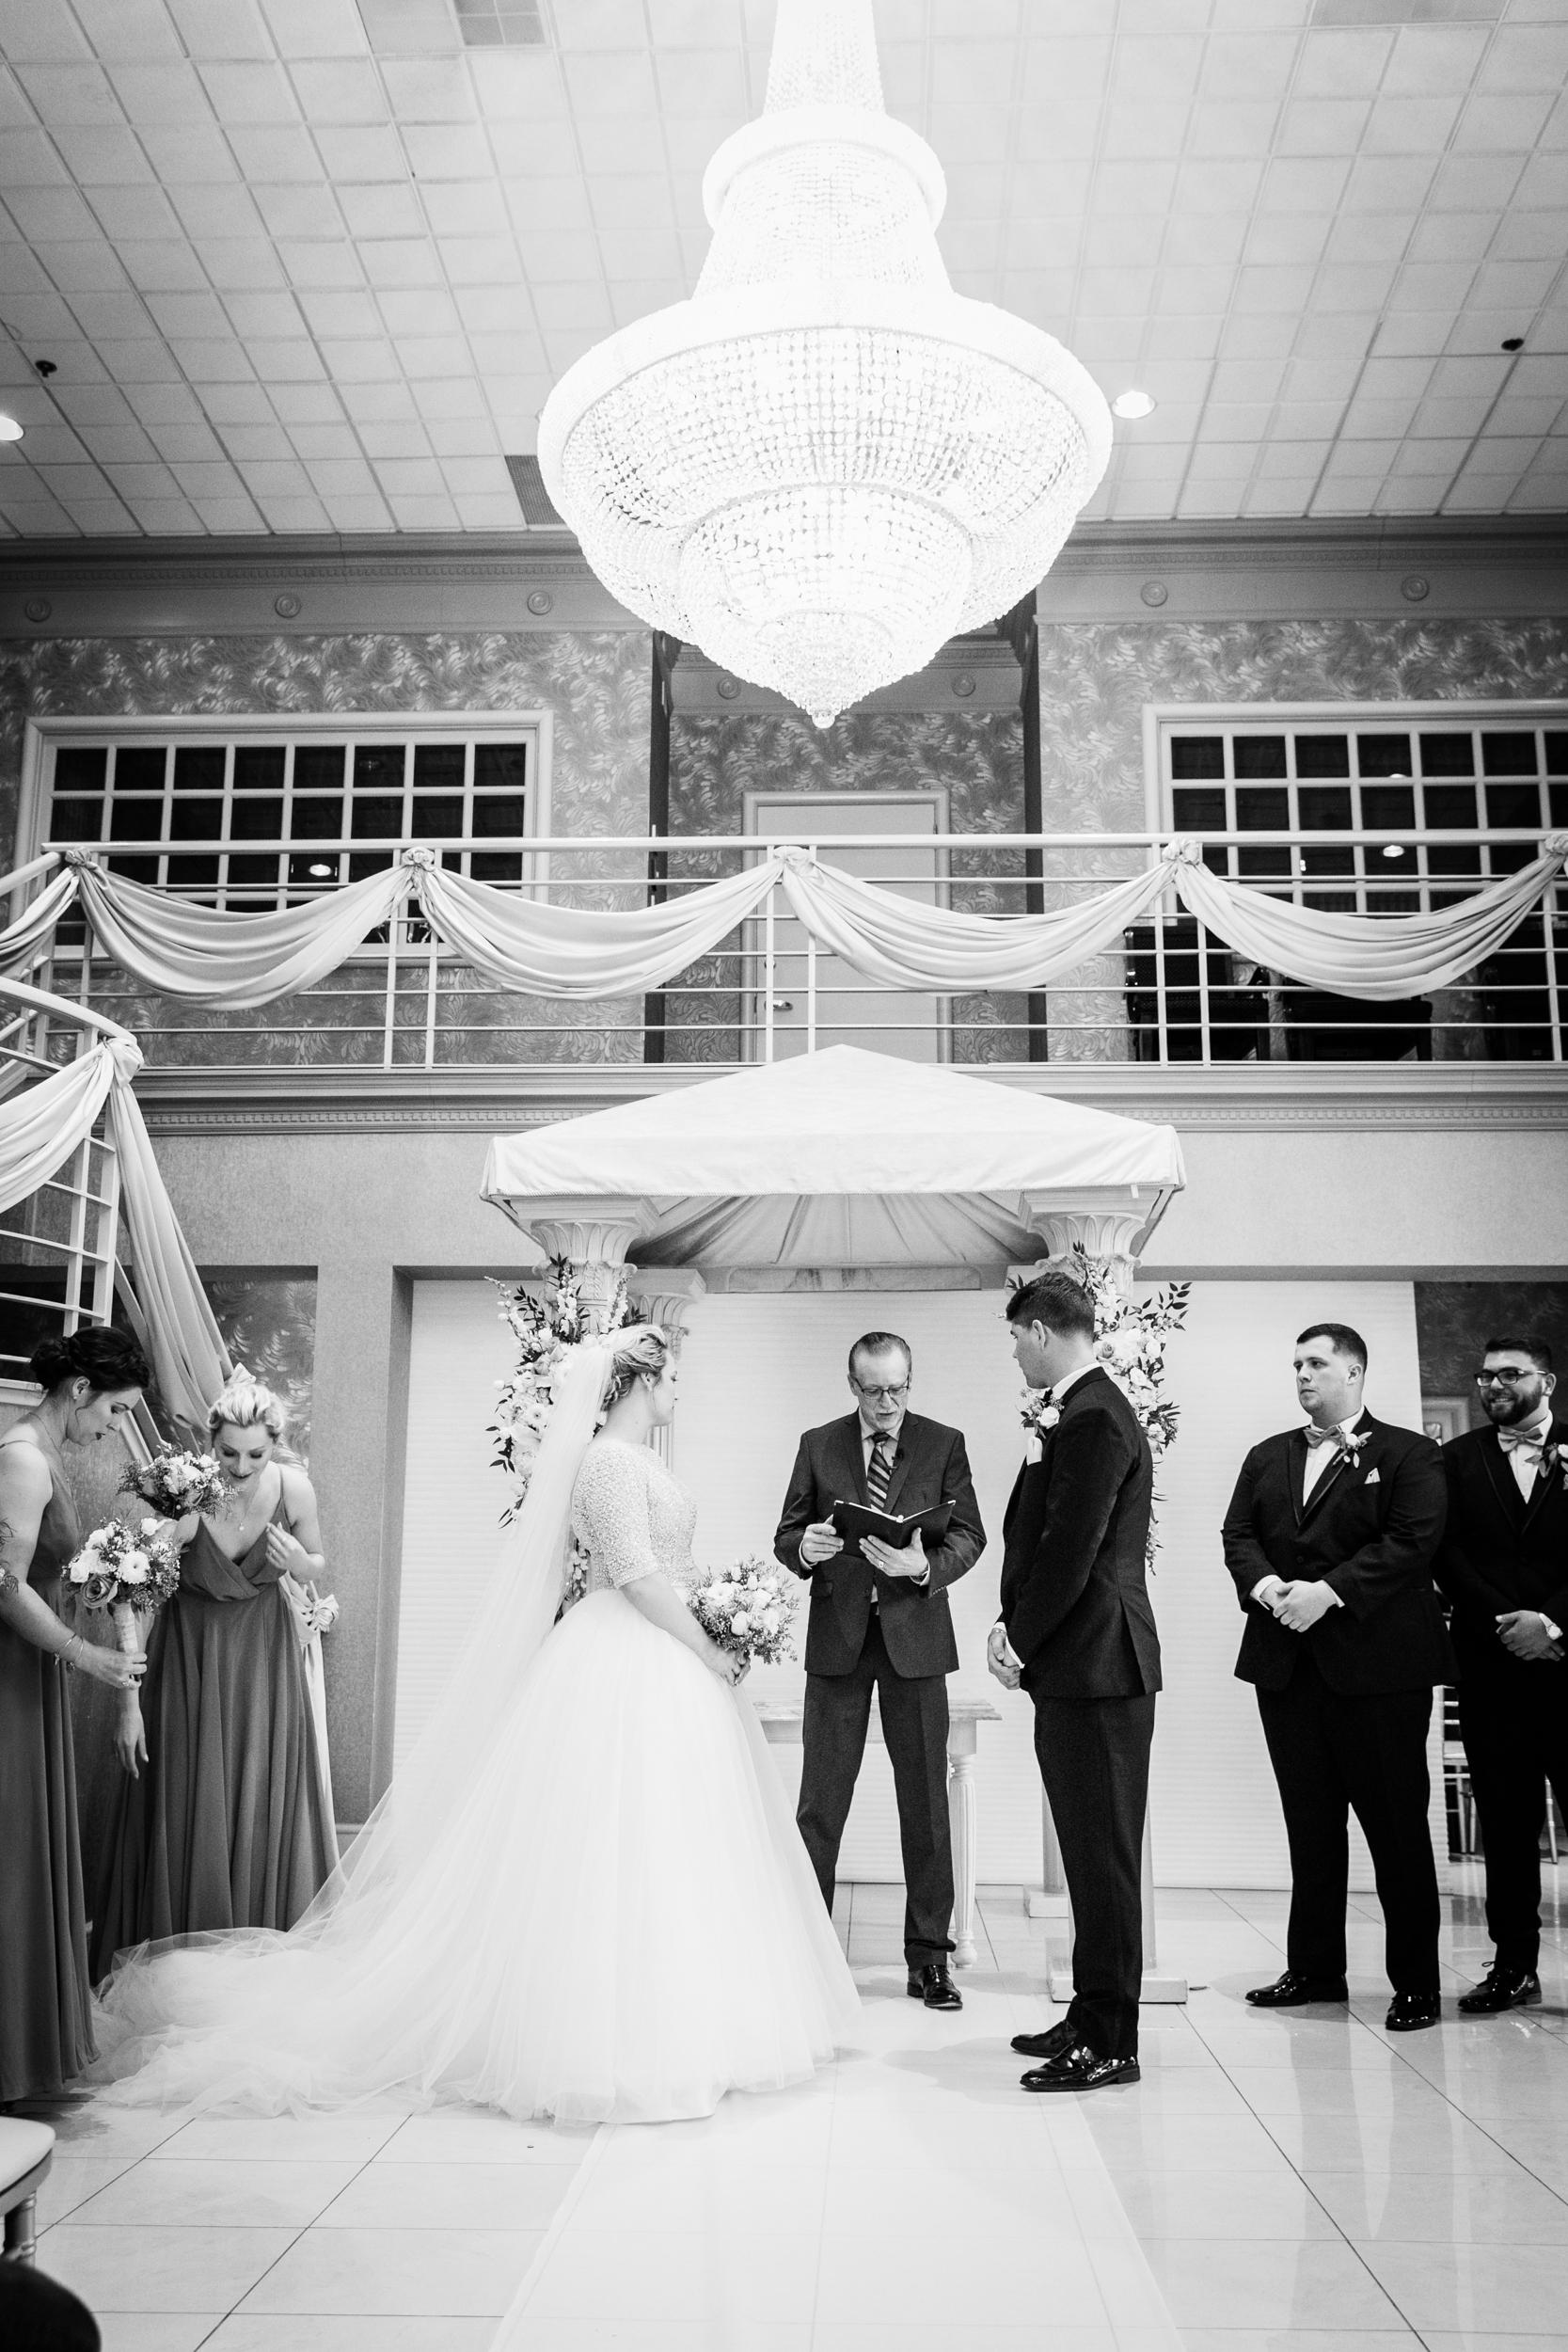 CELEBRATIONS BENSALEM WEDDING PHOTOGRAPHY-48.jpg